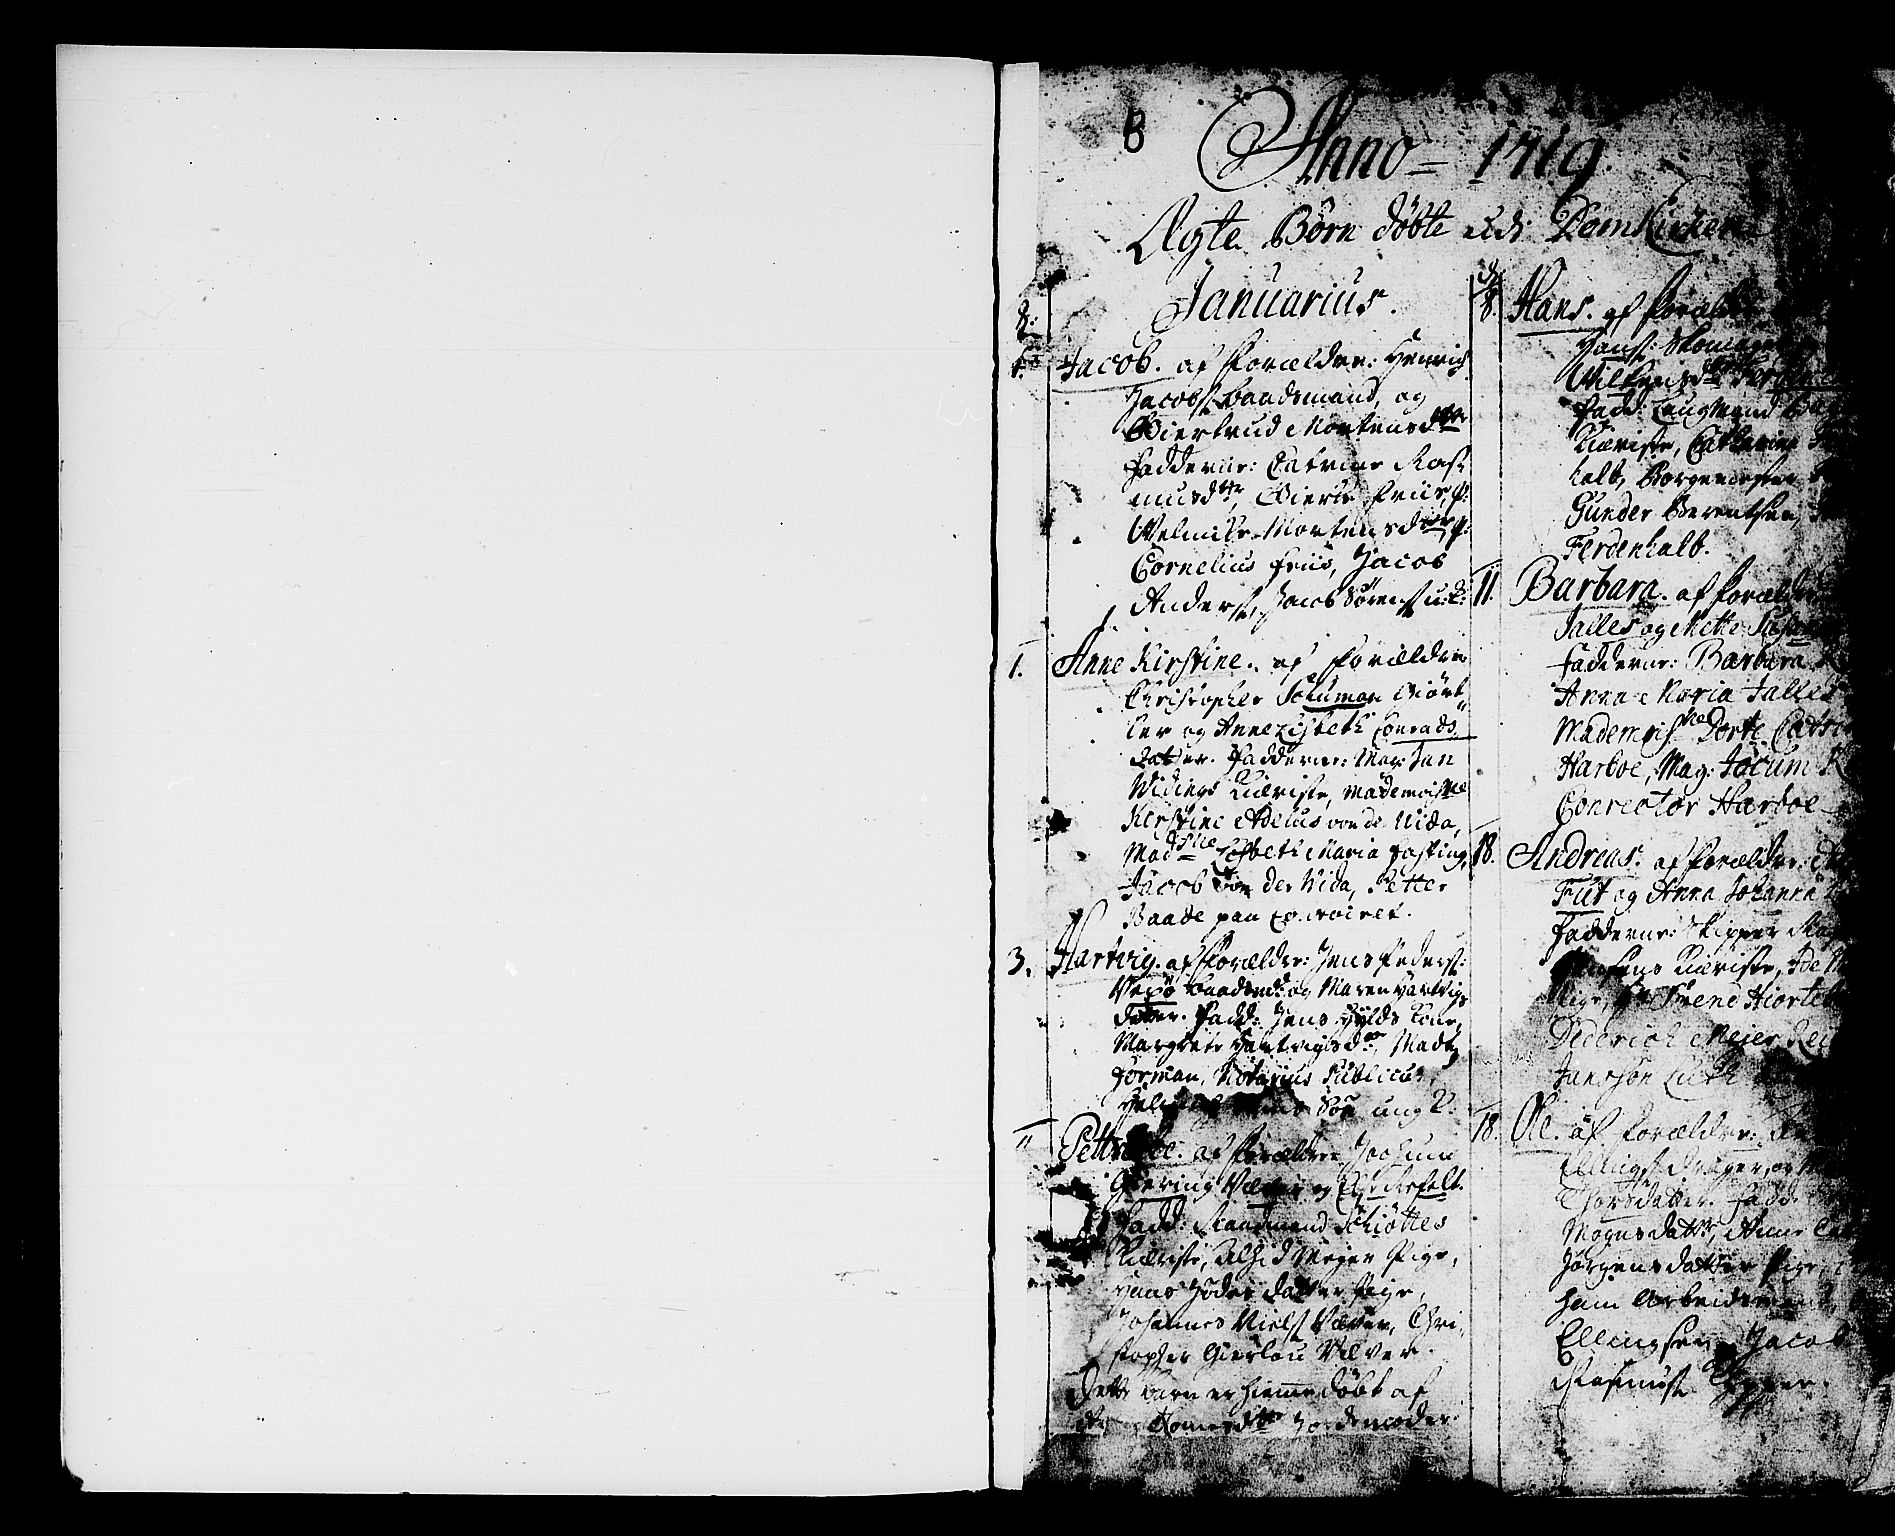 SAB, Domkirken Sokneprestembete, H/Haa/L0001: Parish register (official) no. A 1, 1719-1732, p. 0-1